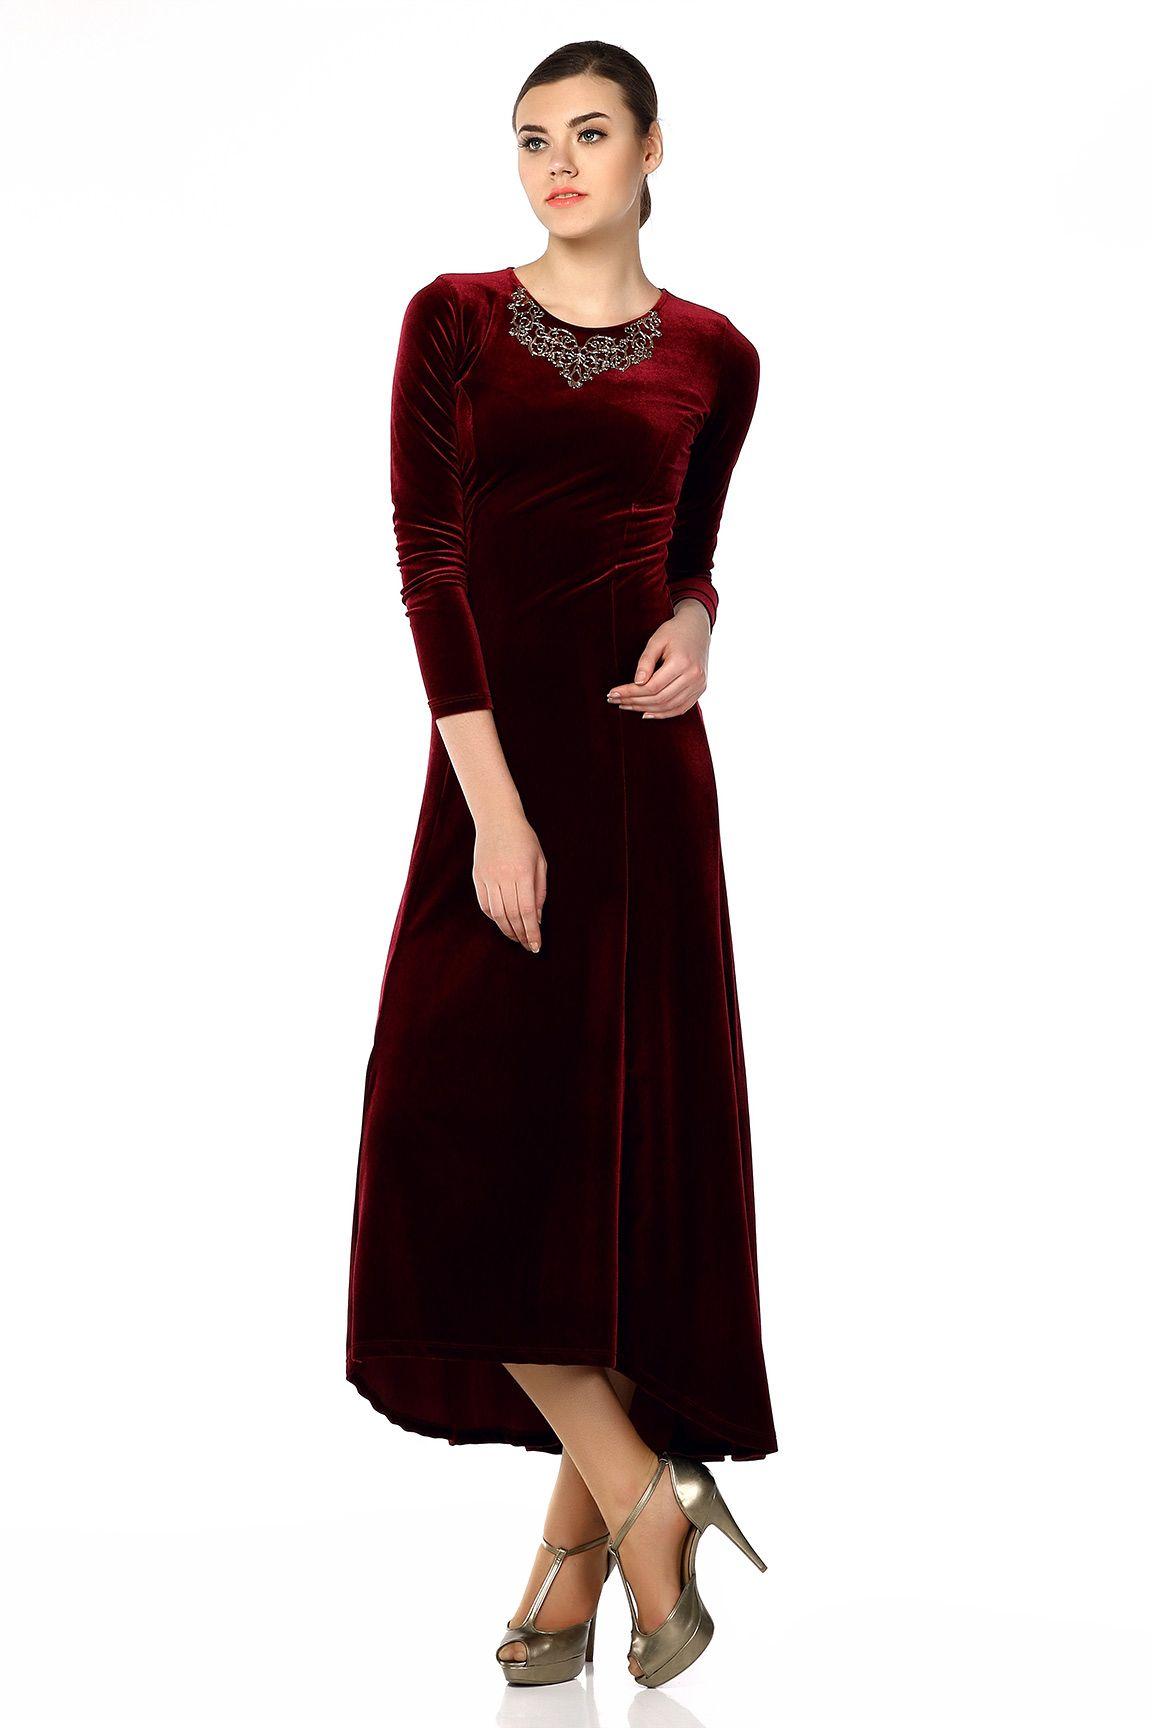 Bordo Yaka Aksesuarli Kadife Elbise Tozlu Com Elbise Elbiseler Giyim